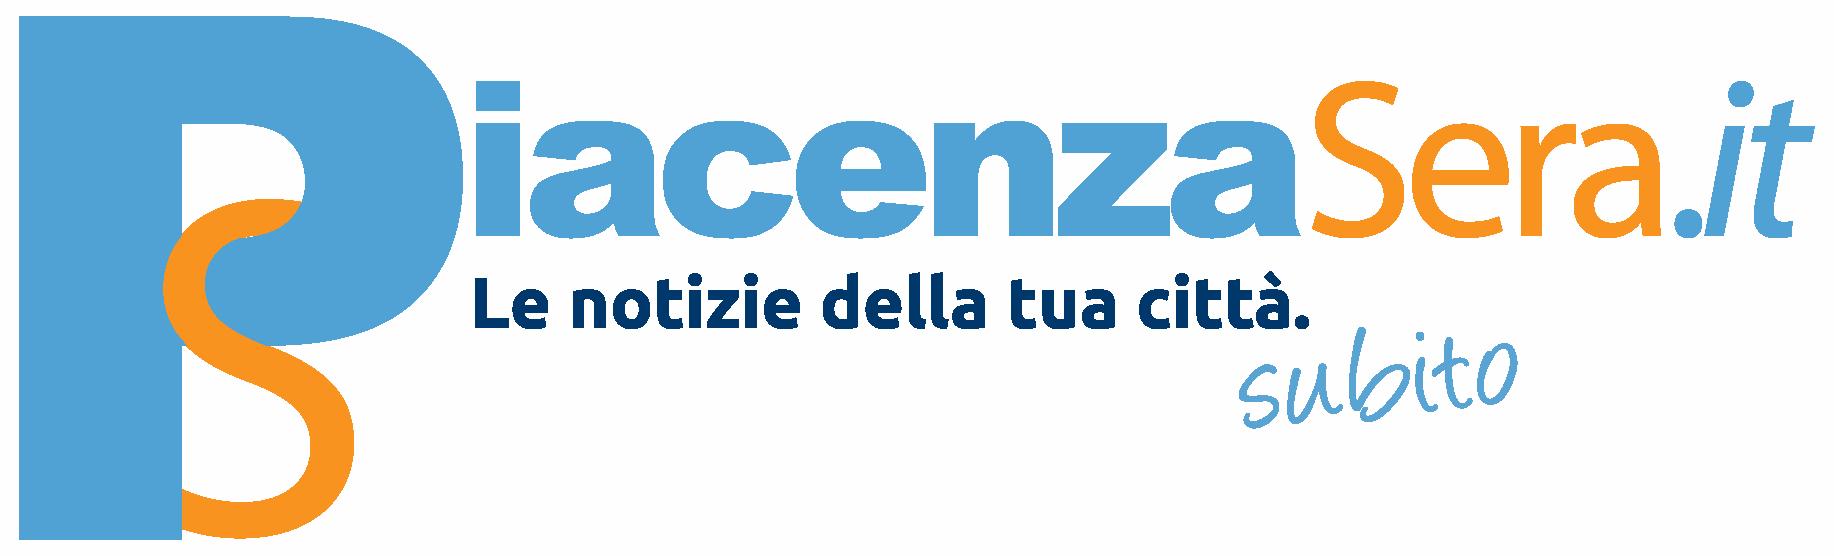 PiacenzaSera.it - Notizie in tempo reale a707b17dc3b